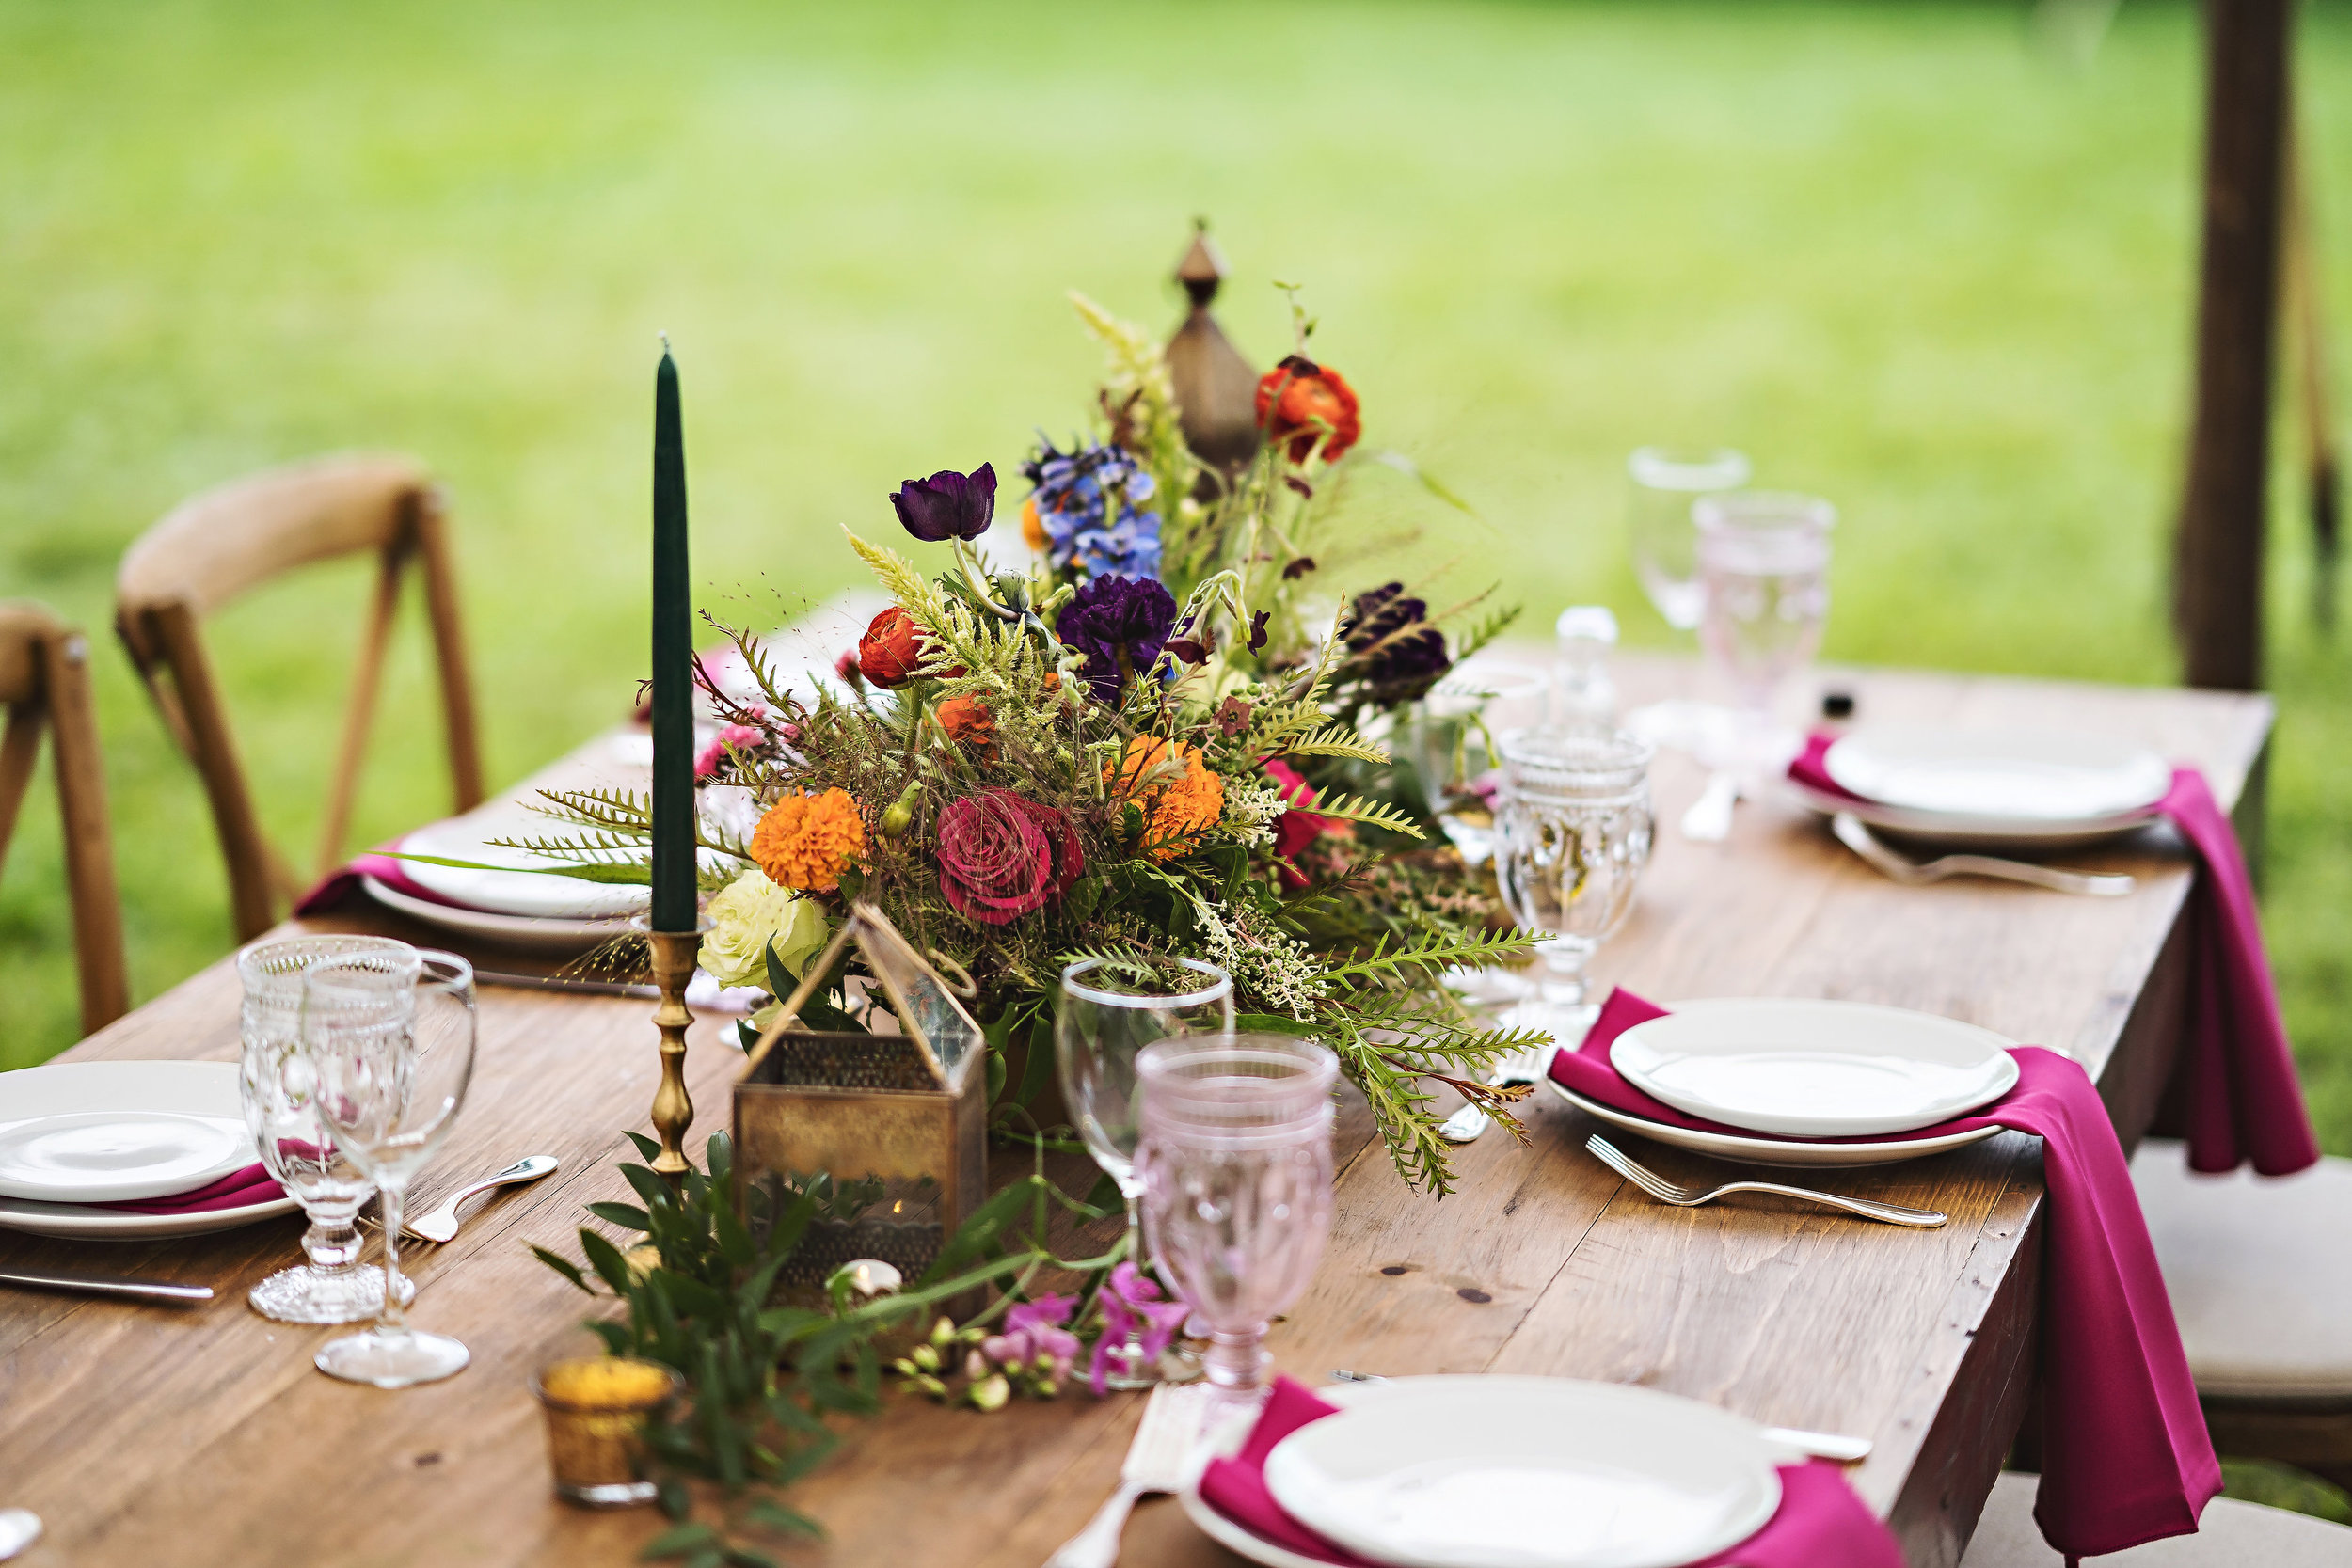 upstate-ny-wedding-jove-meyer-events-inbal-sivan-047.jpg